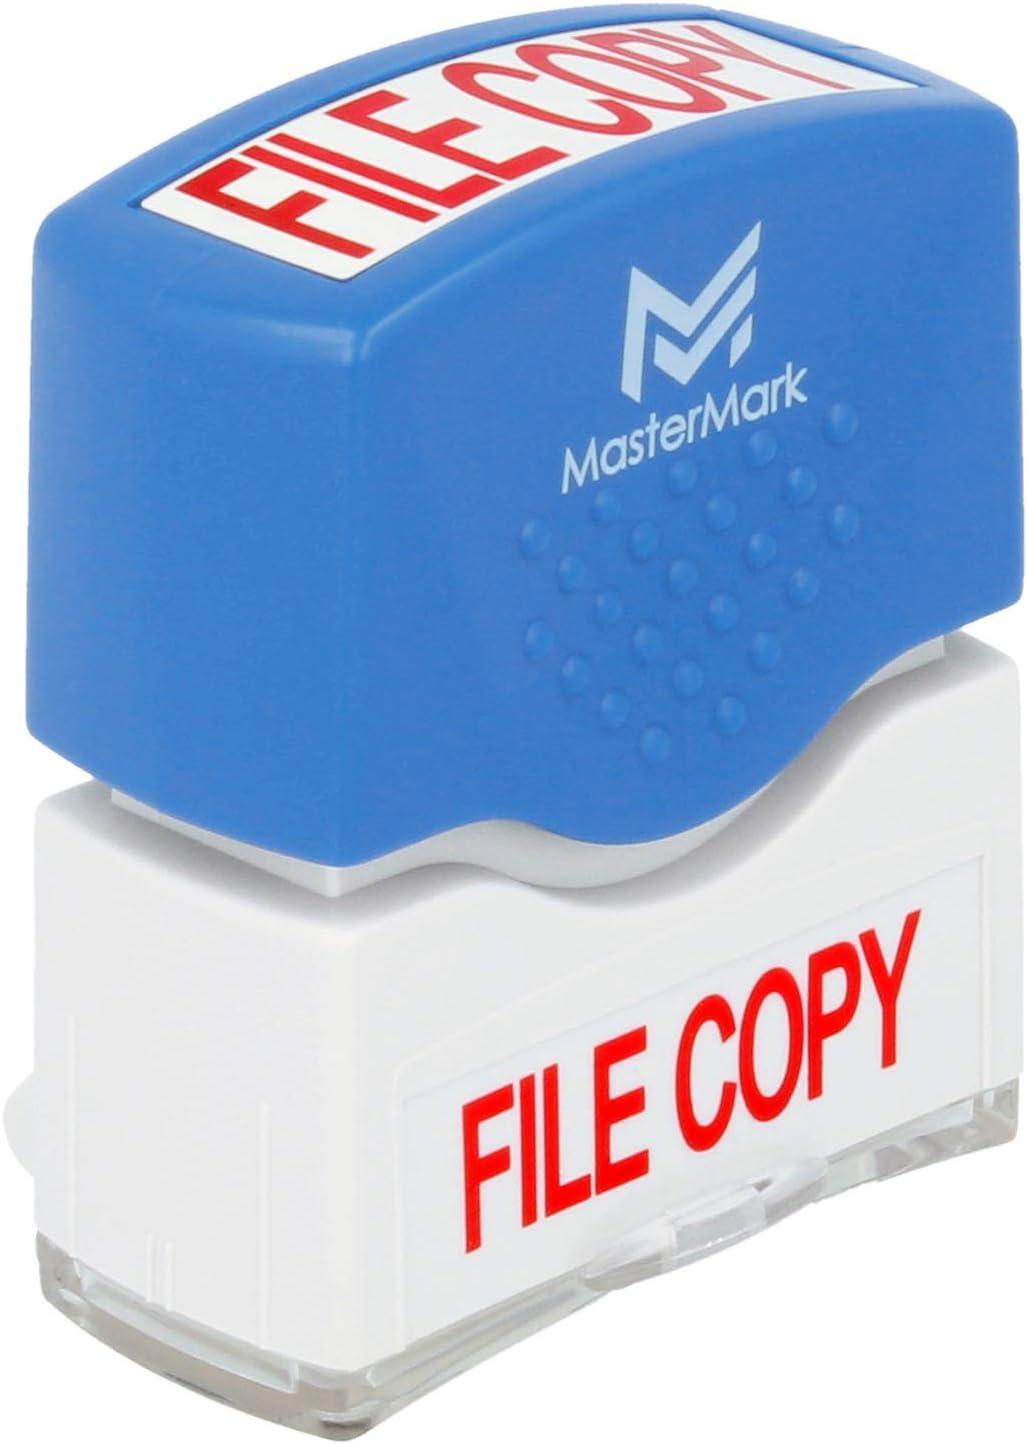 File Copy Stamp – MasterMark Premium Pre-Inked Office Stamp